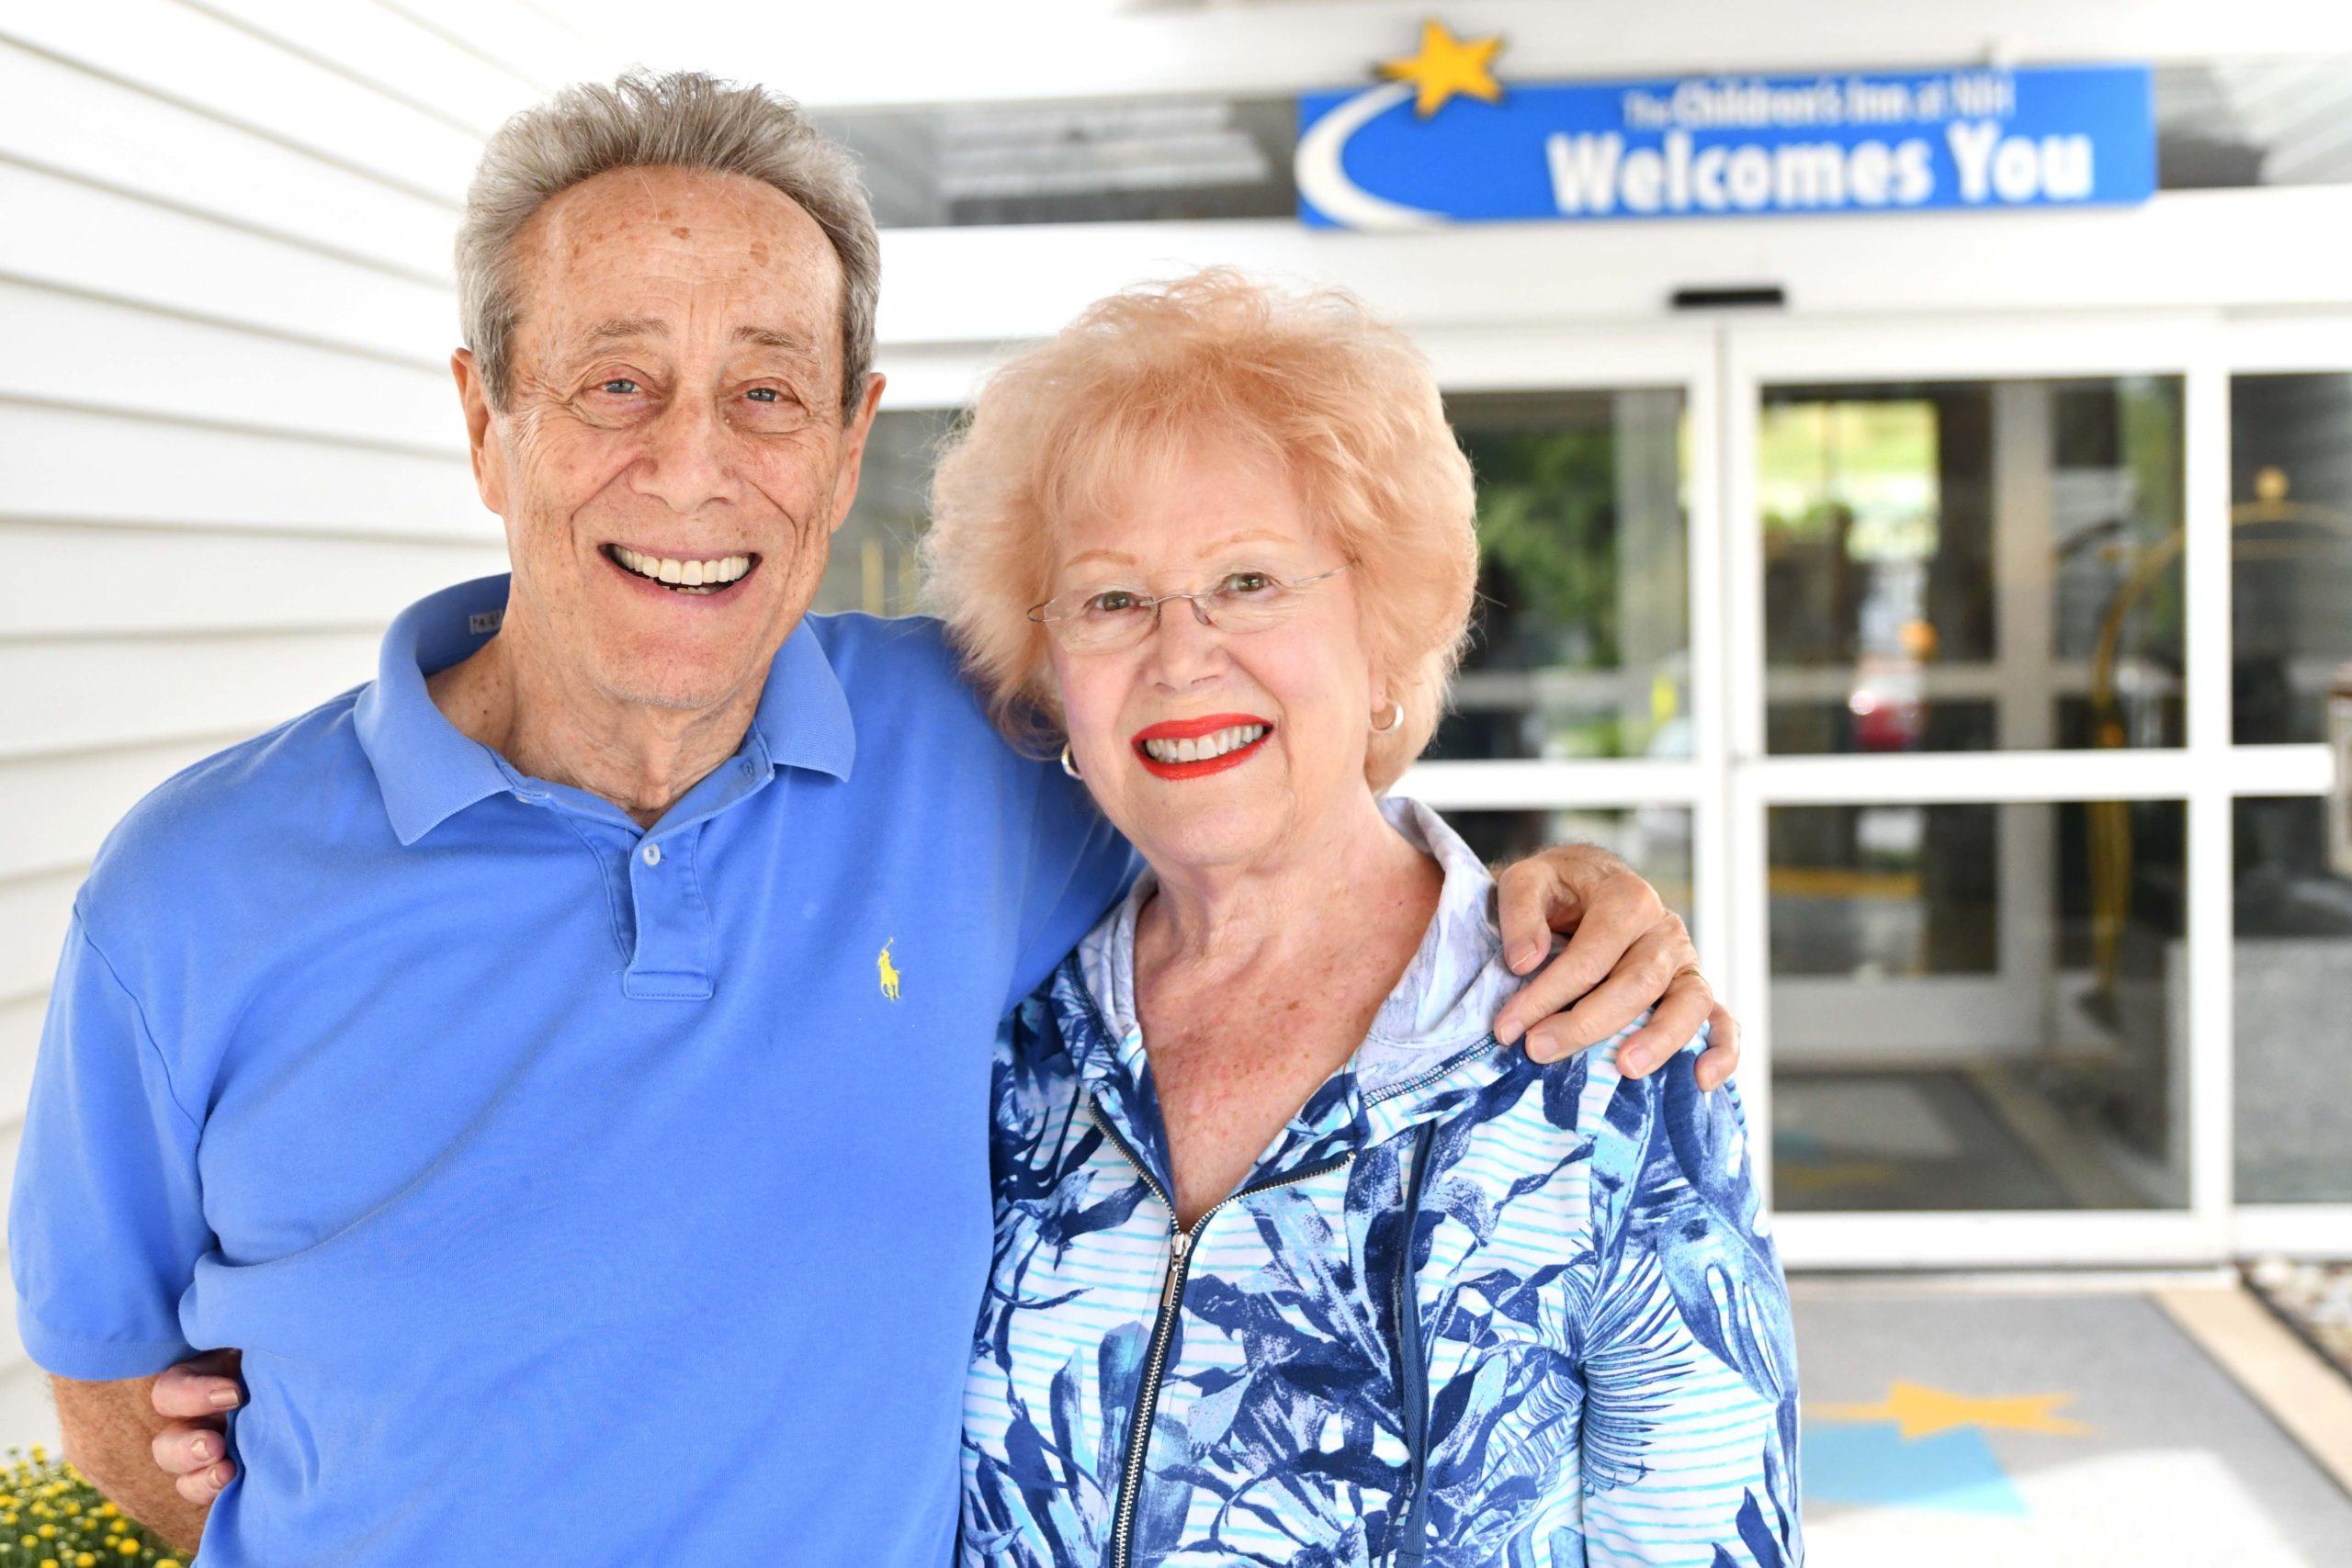 Barry and Barbara Gordon - Inn volunteers